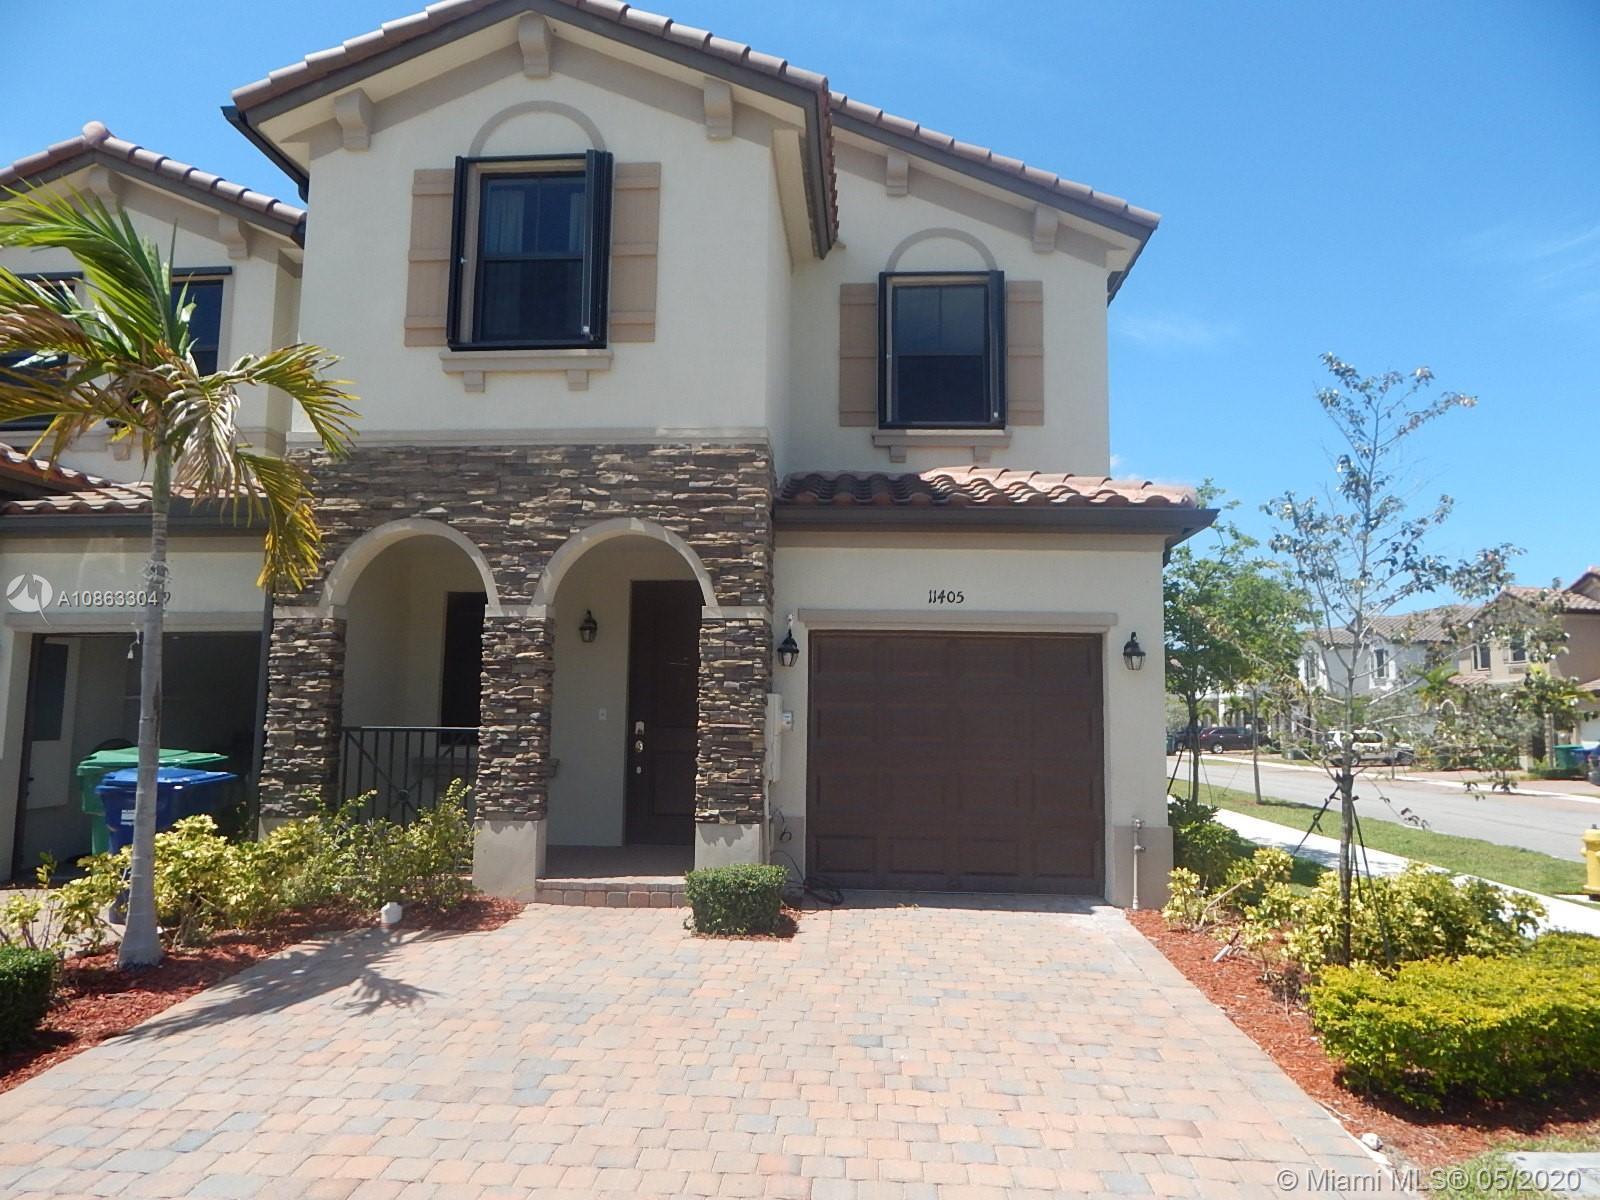 11405 SW 252nd Ter #11405, Homestead, FL 33032 - Homestead, FL real estate listing